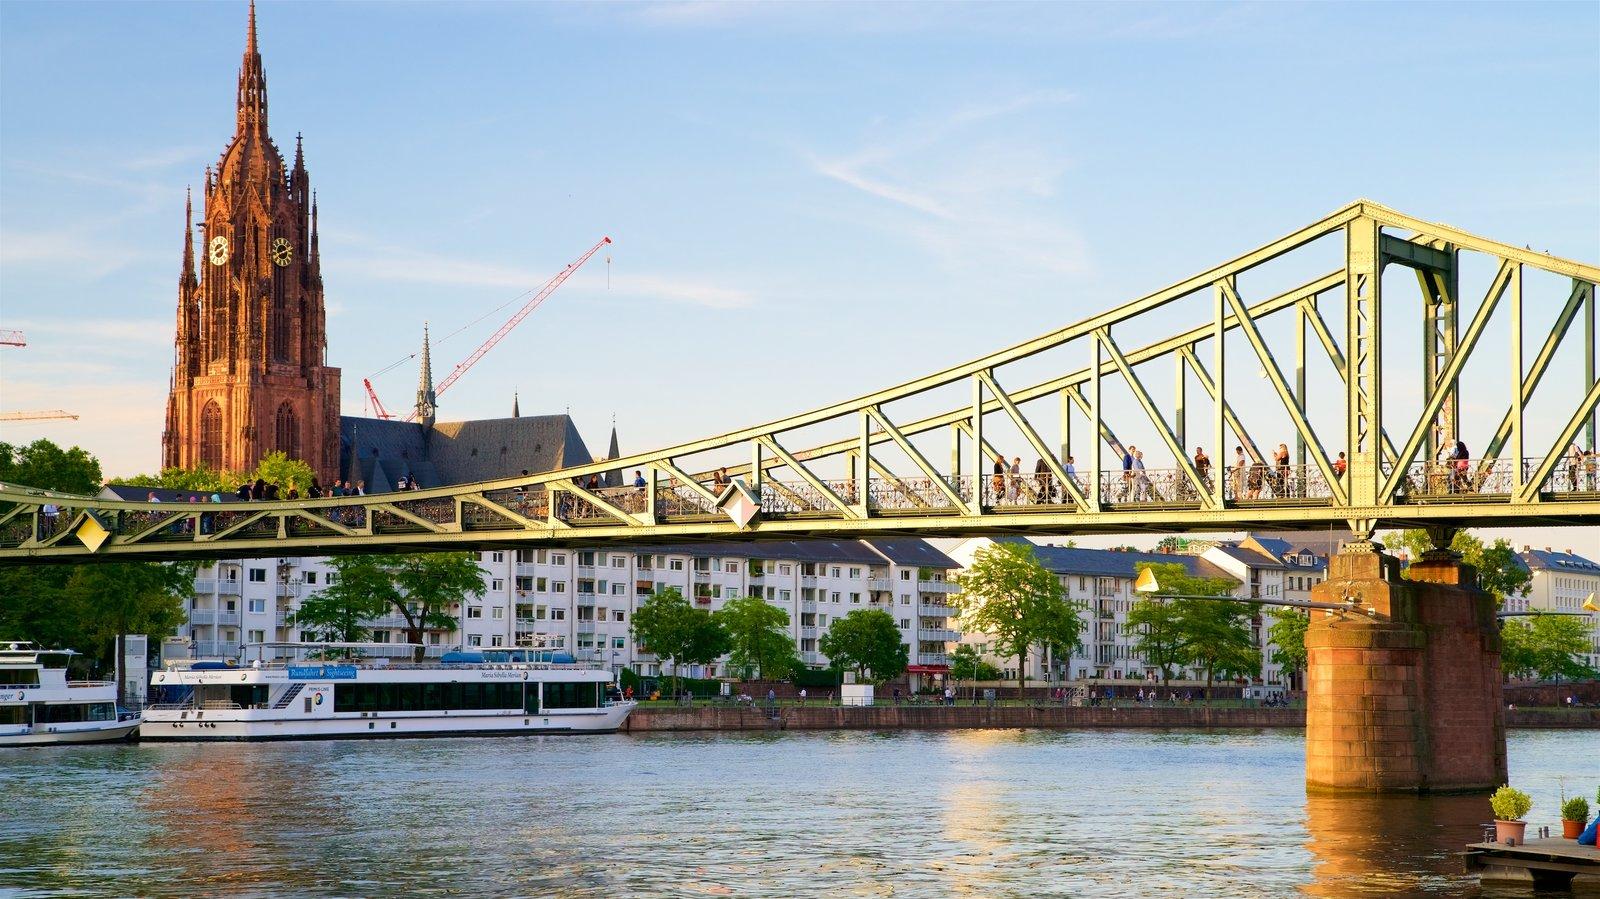 Sunset Sunrise Pictures View Images Of Frankfurt - Frankfurt river